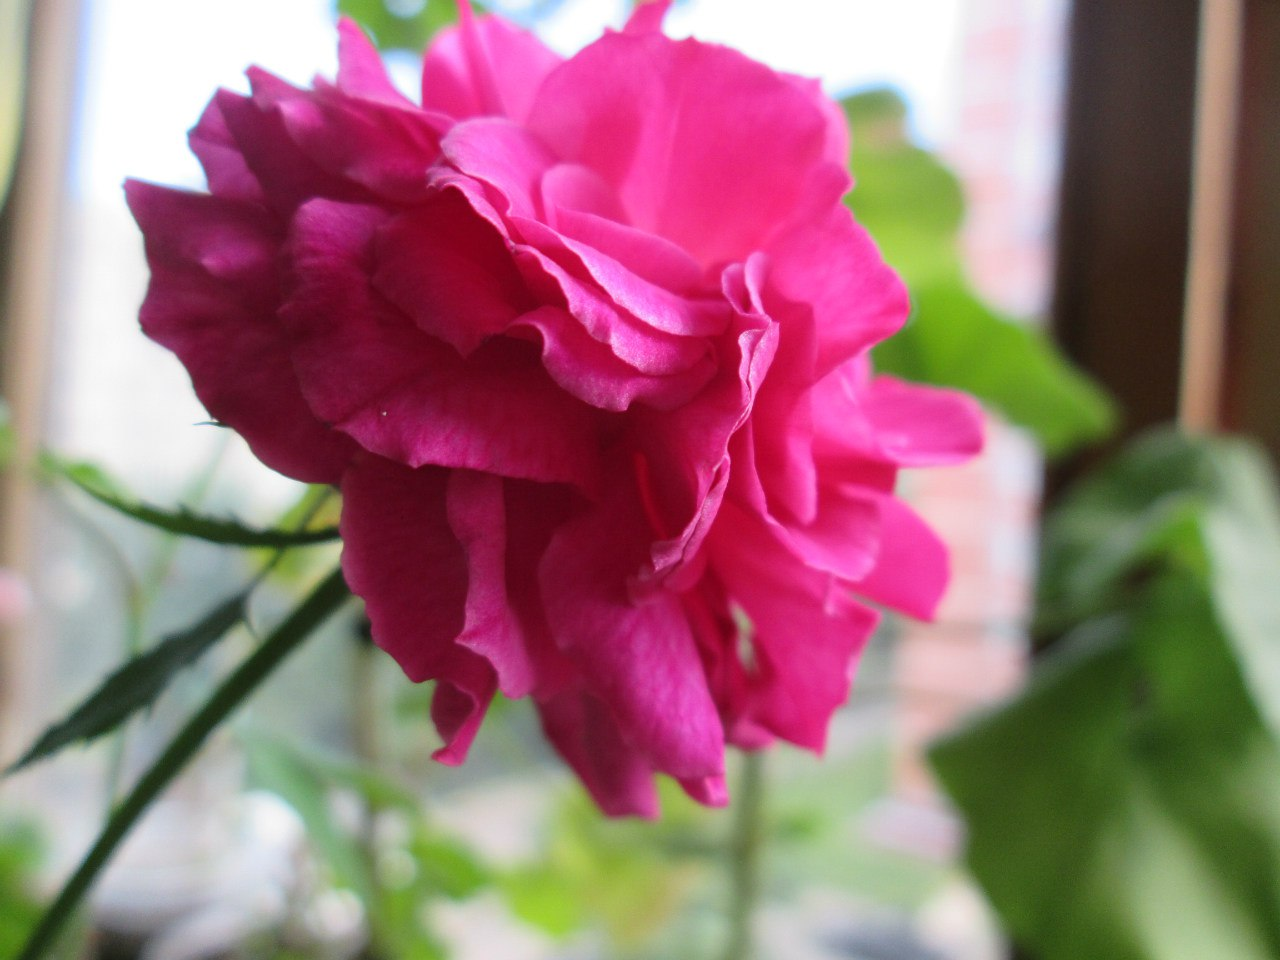 комнатная мини роза уход в домашних условиях